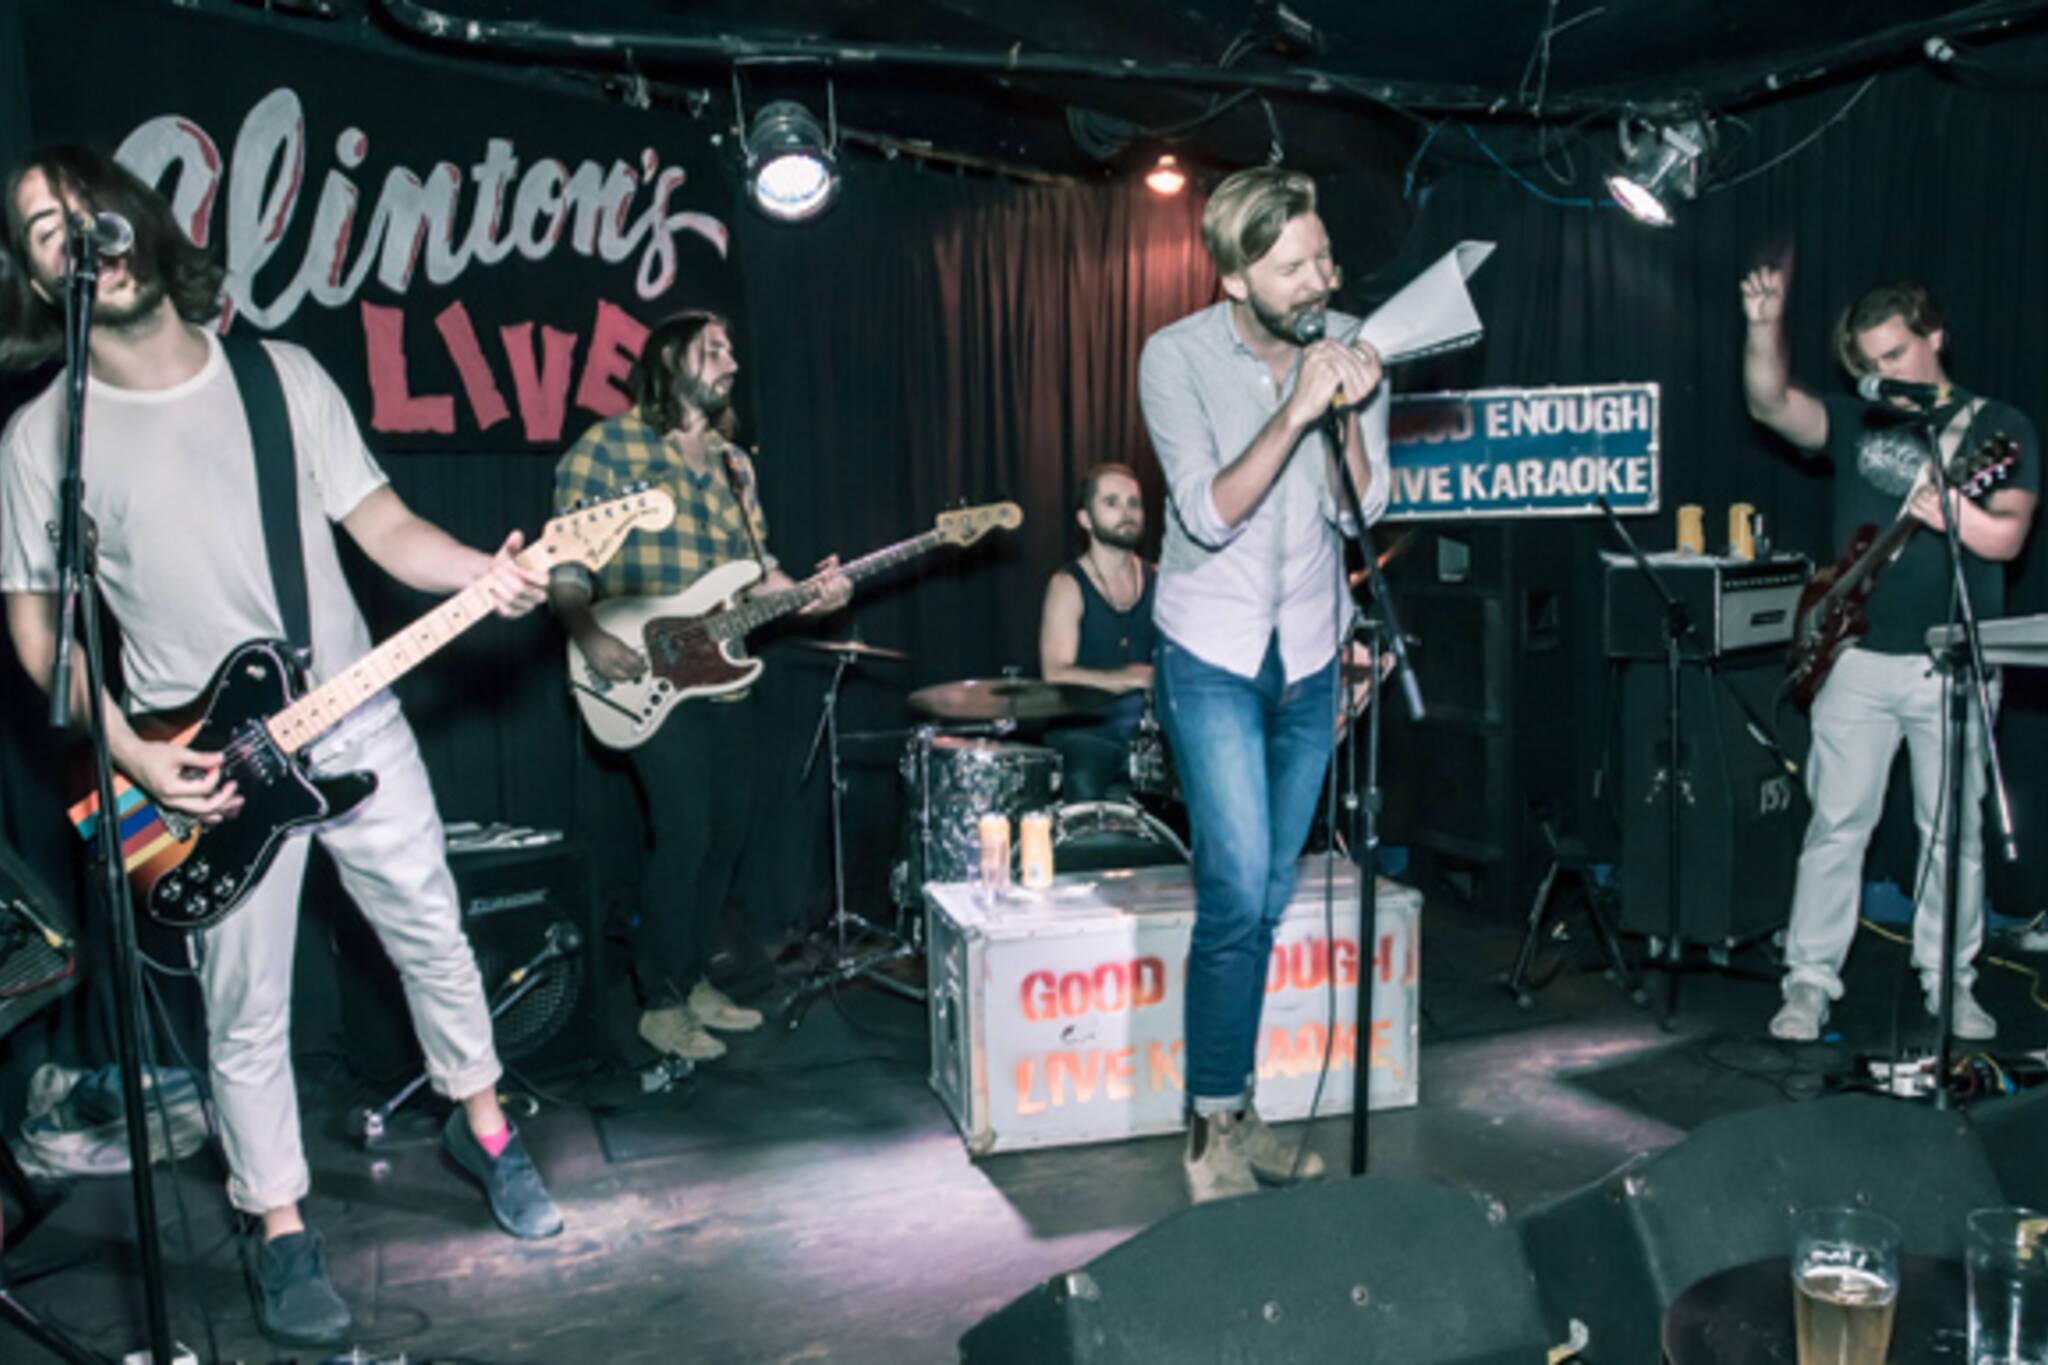 Good Enough live karaoke Toronto